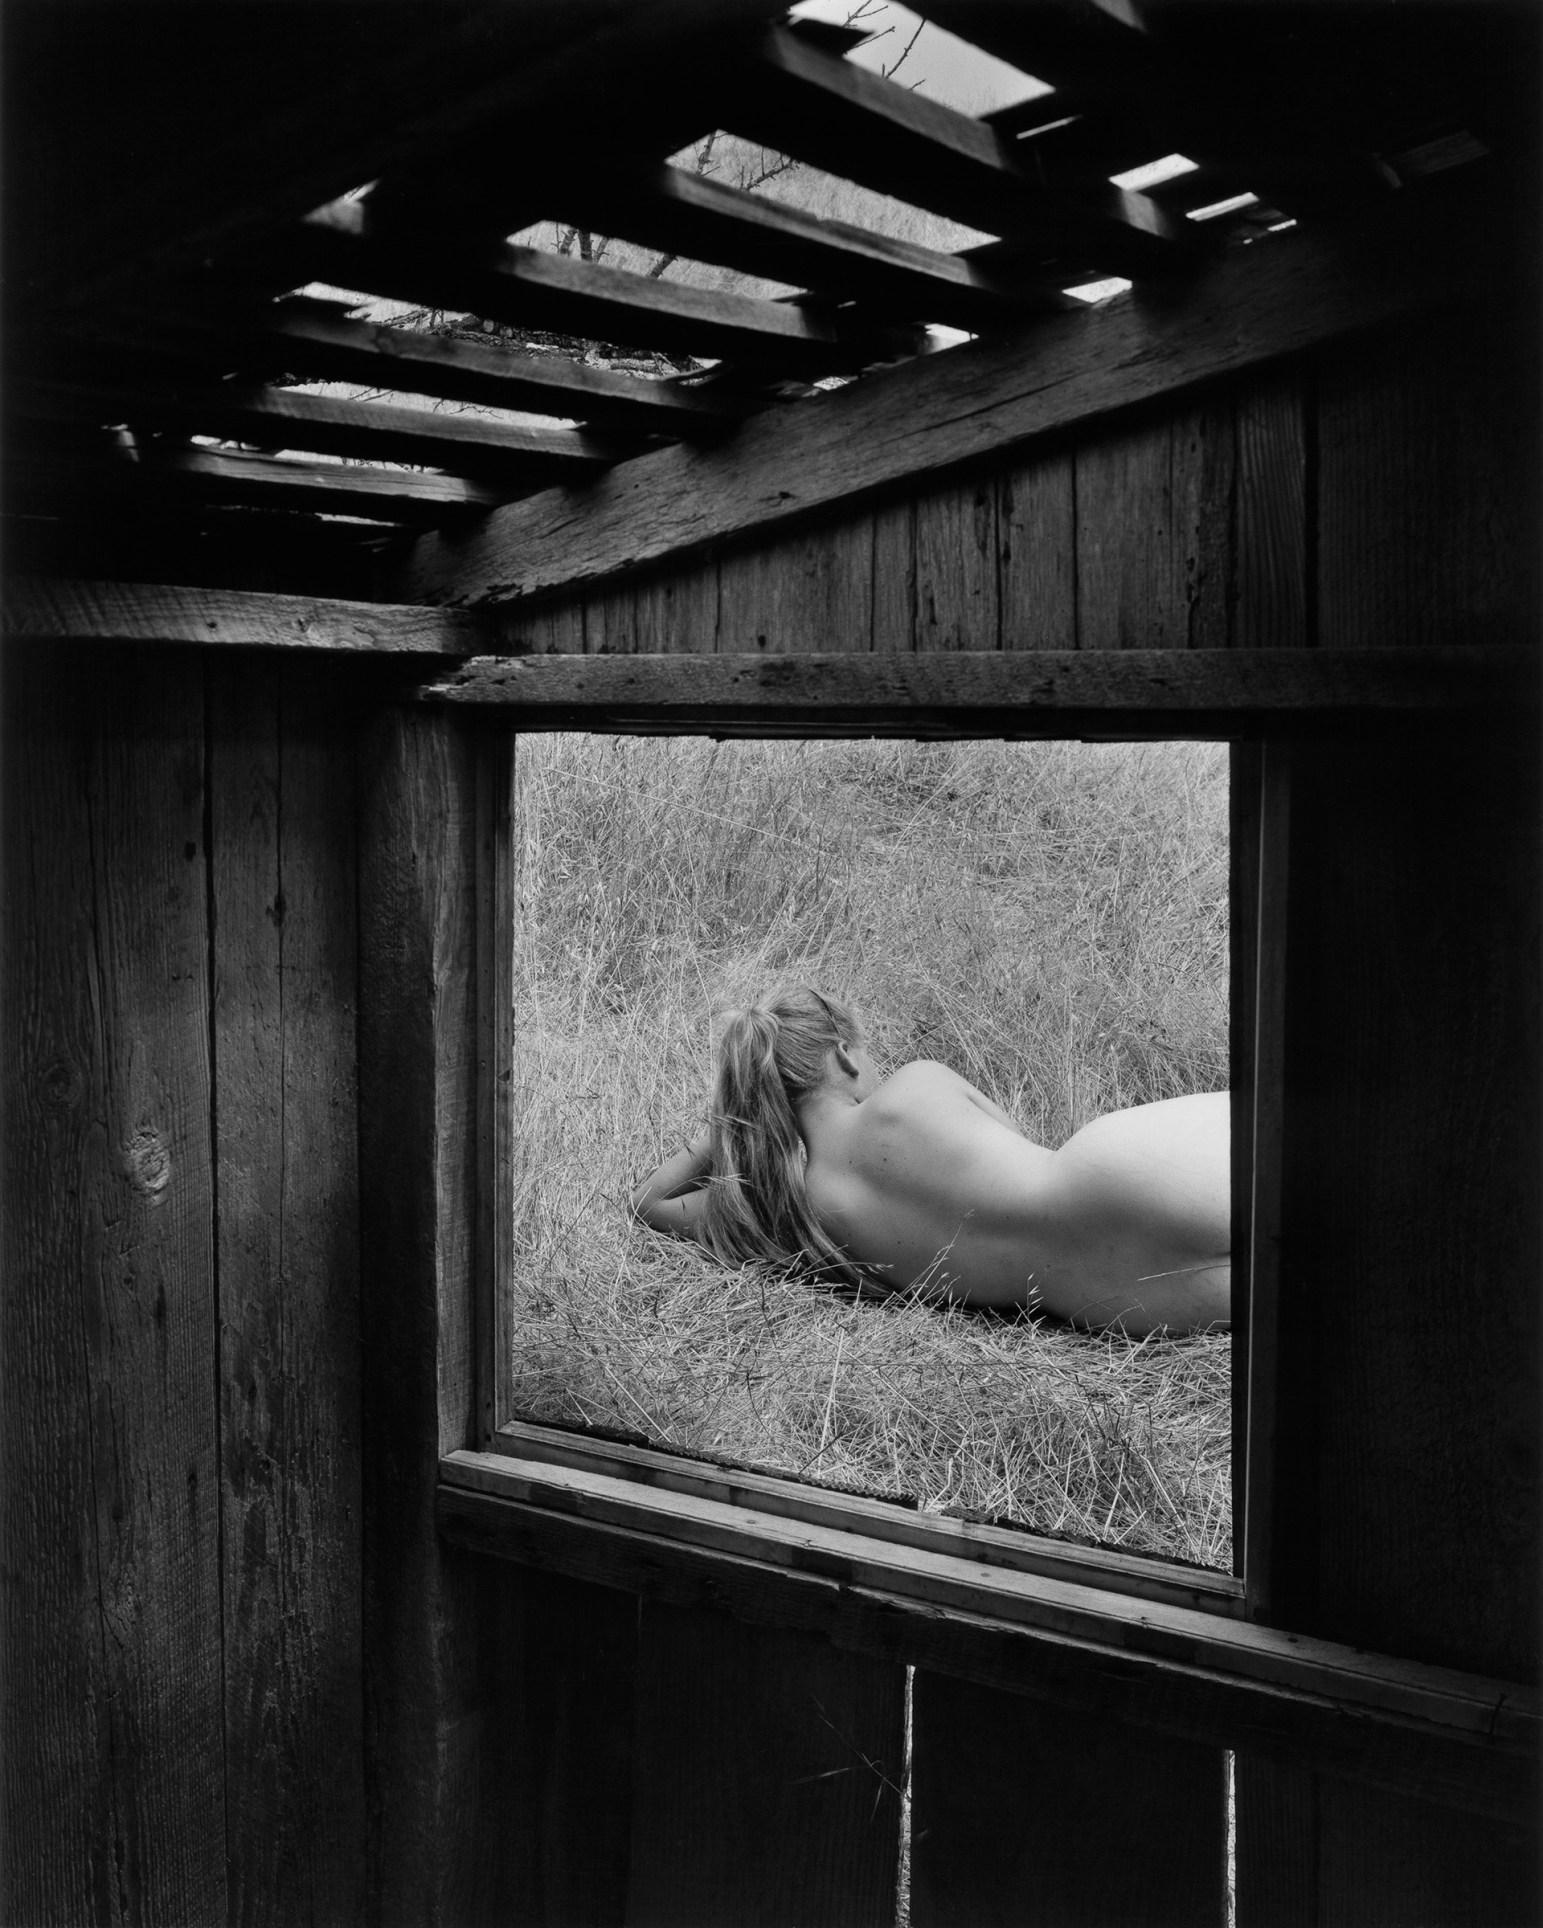 Barbara in Window by Wynn Bullock © Bullock Family Photography, LLC